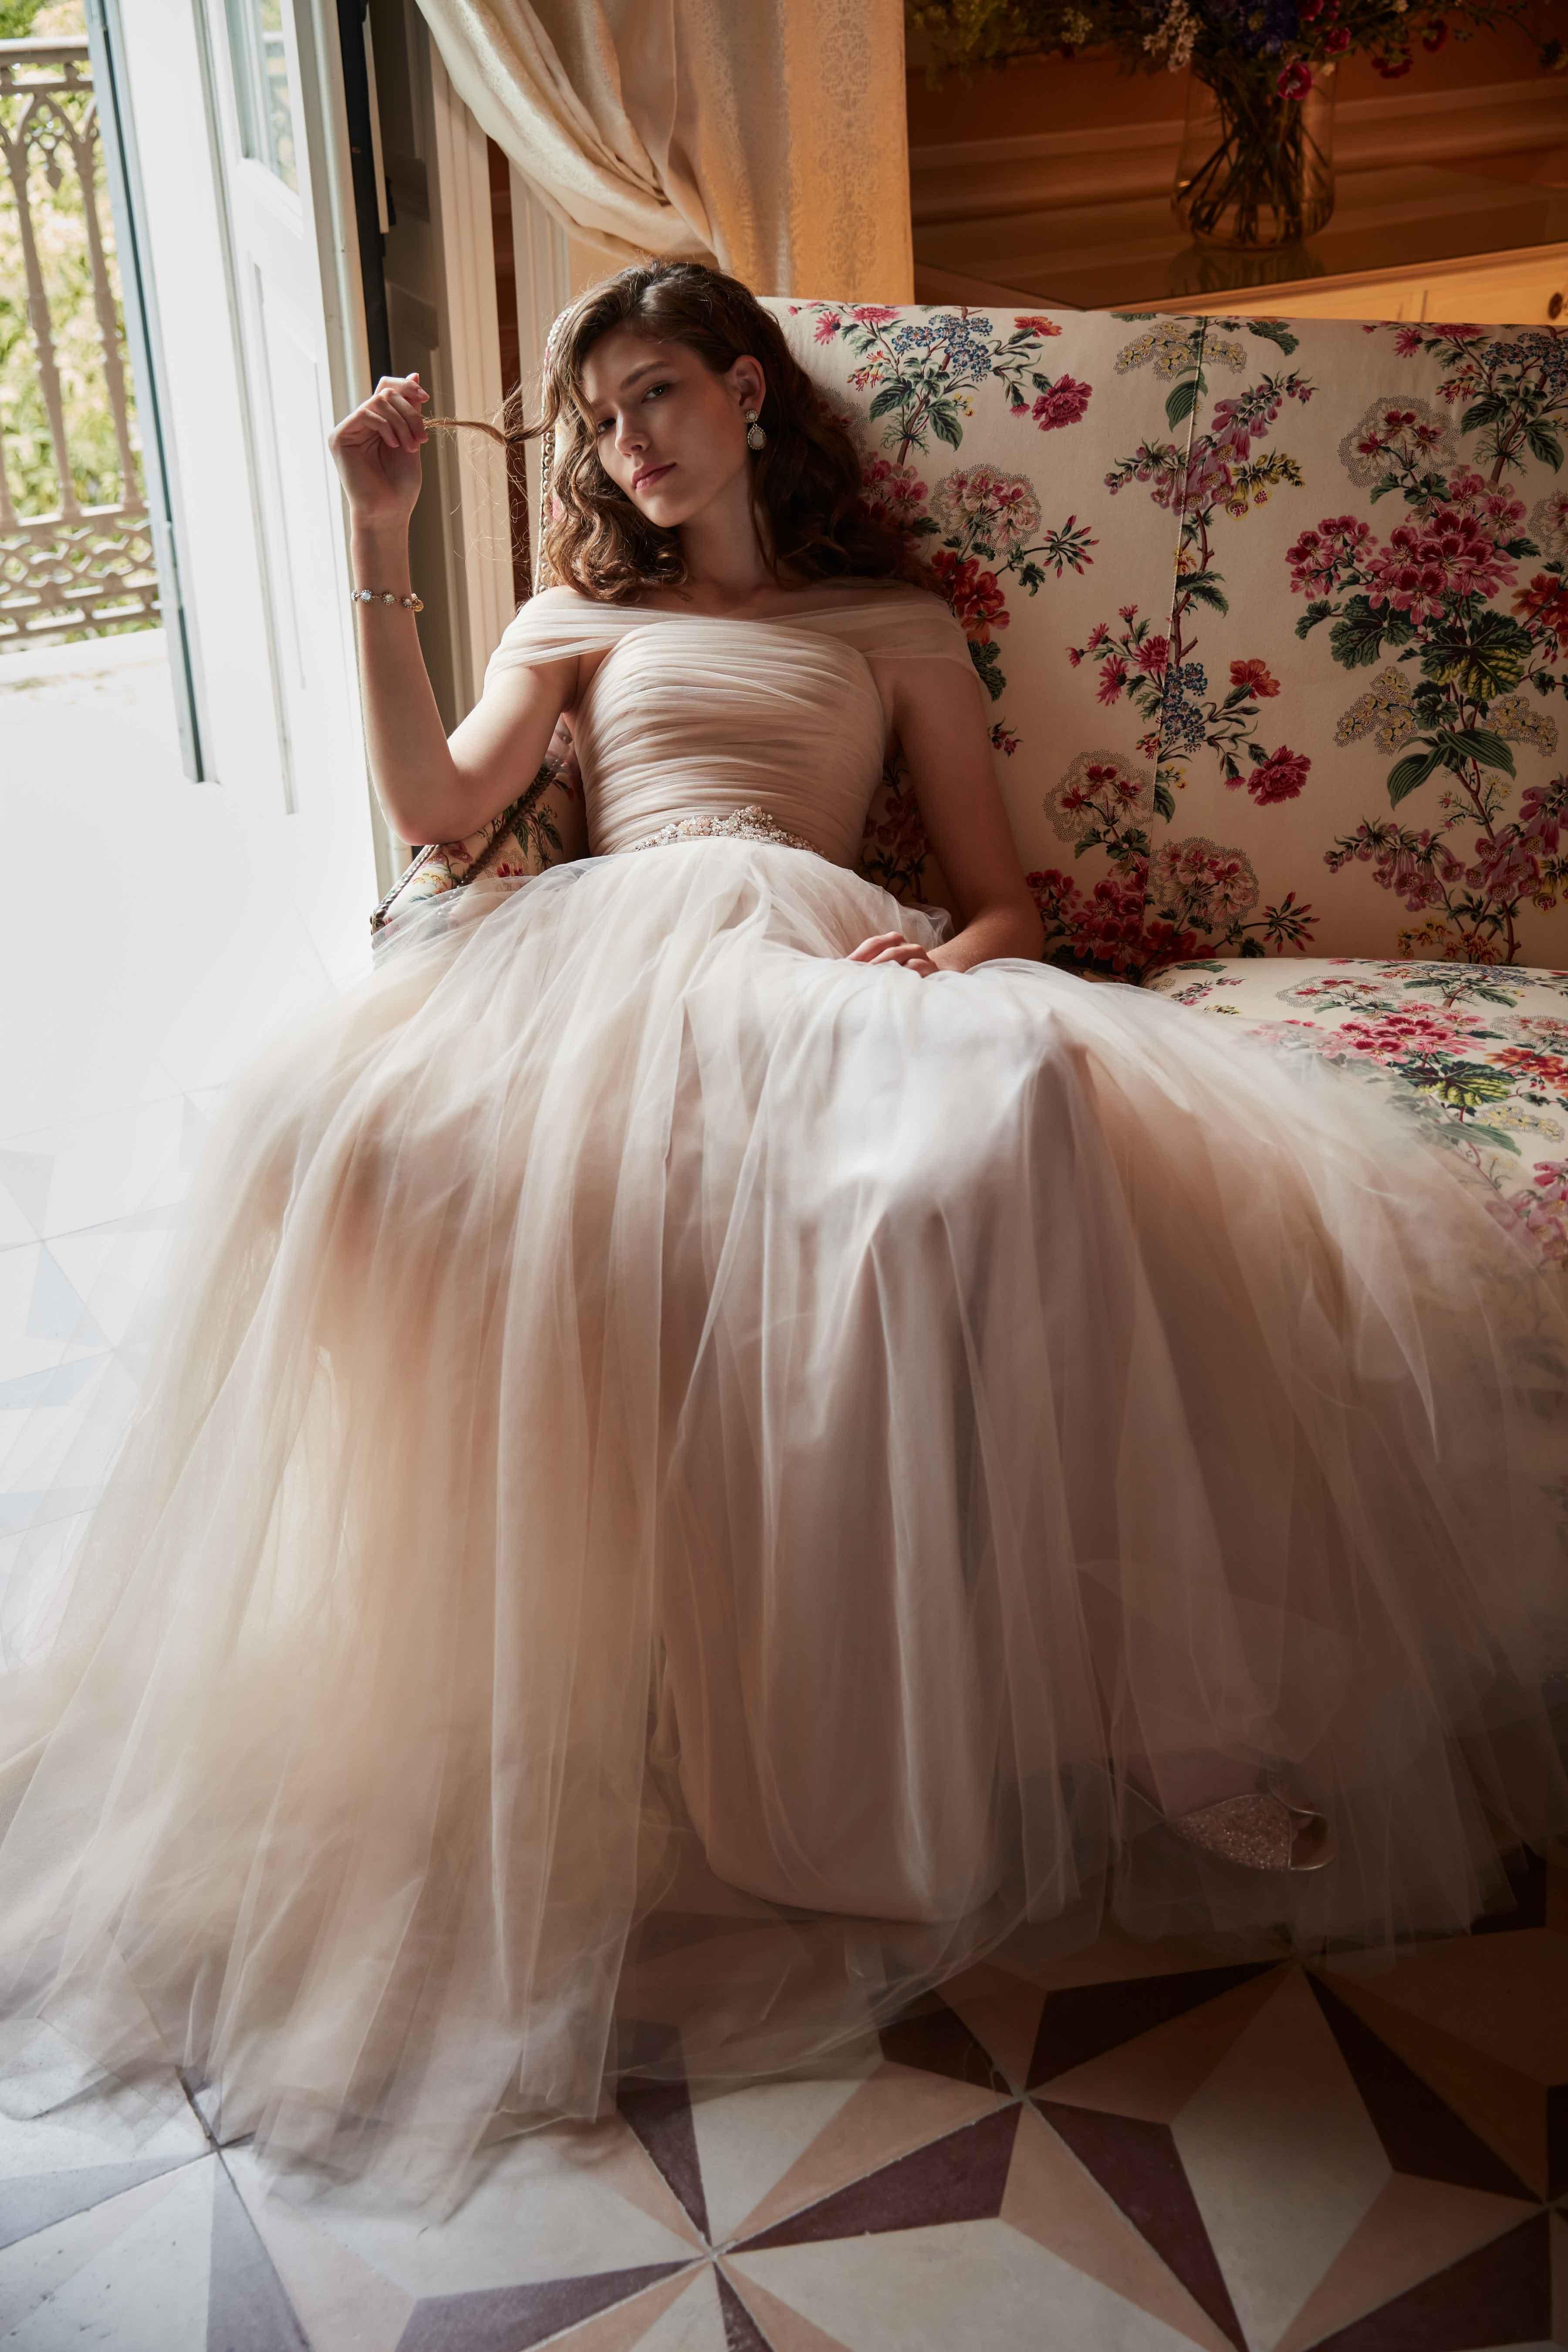 Ramona blush bridal gown wedding dress BHLDN